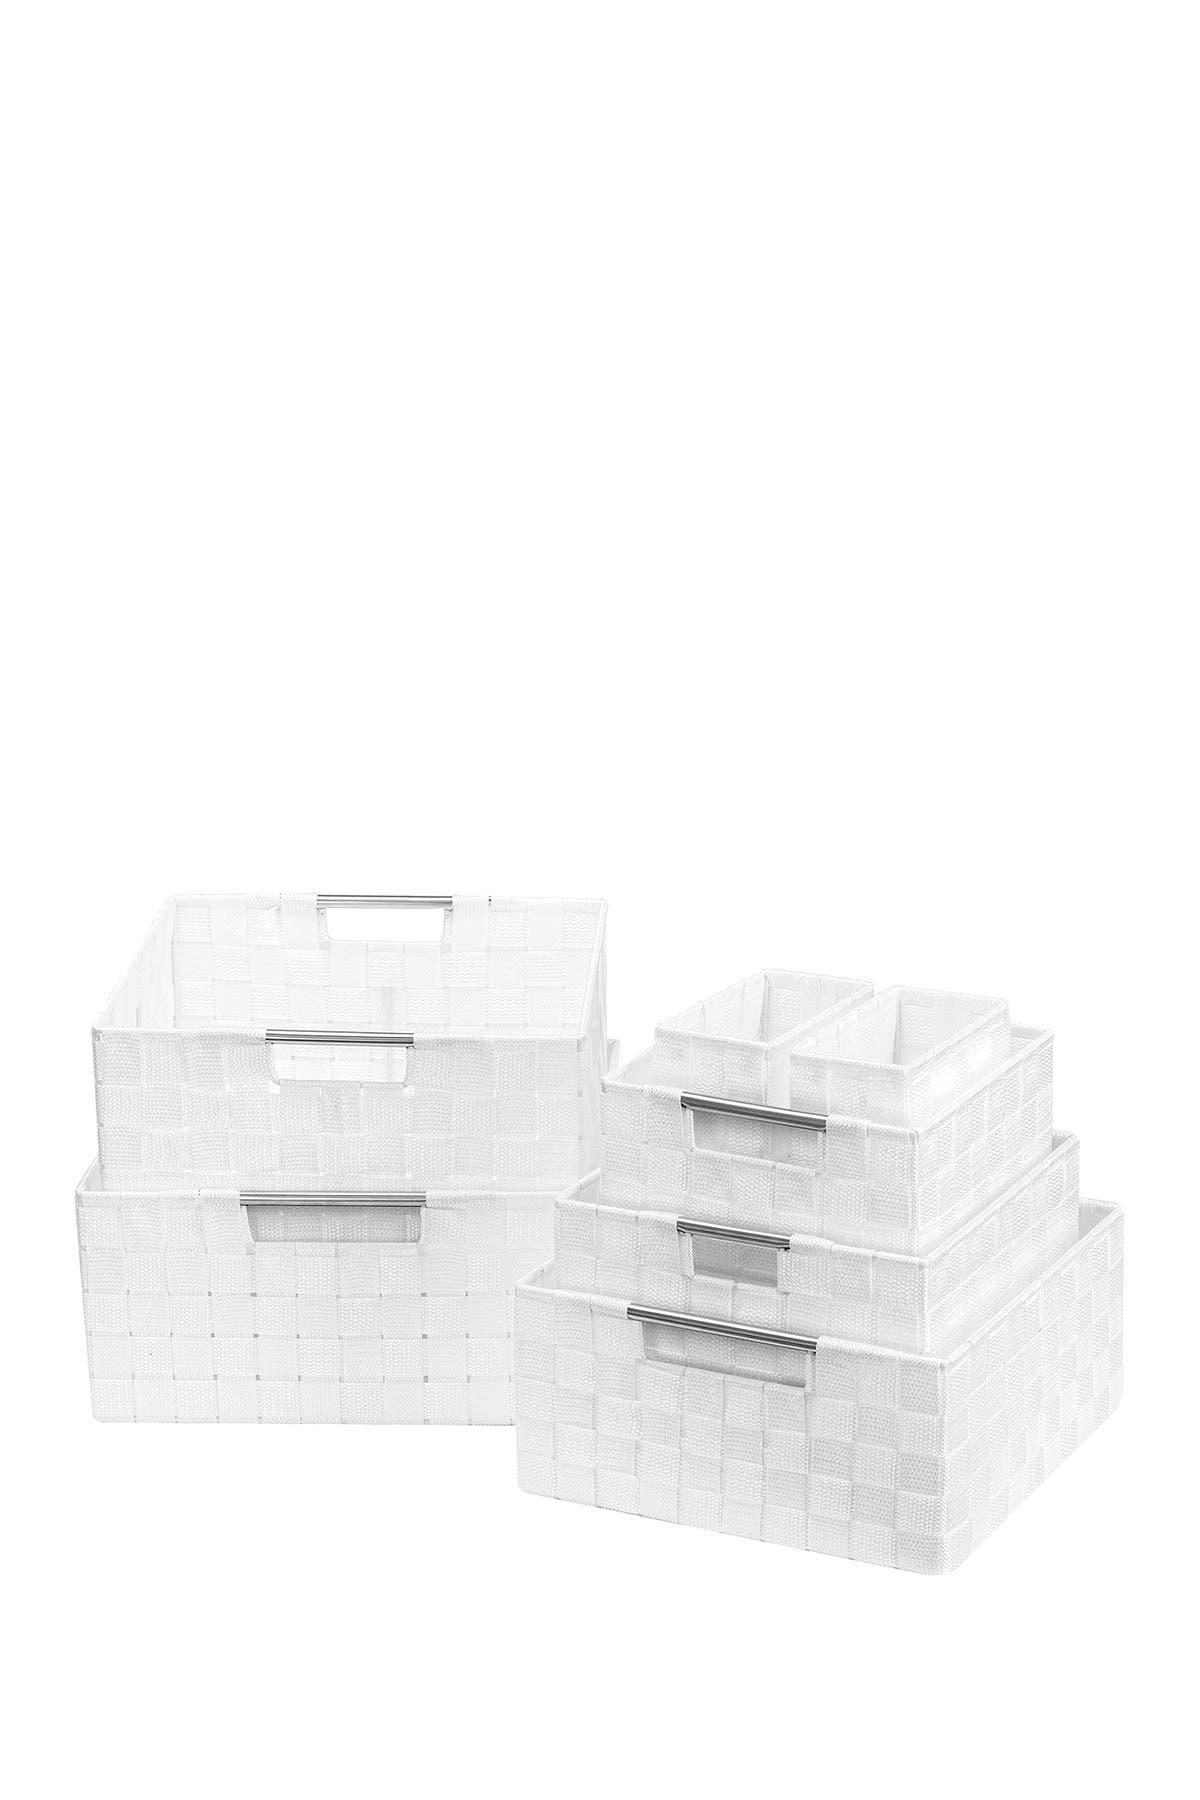 Image of Sorbus White Weave 7-Piece Basket Set